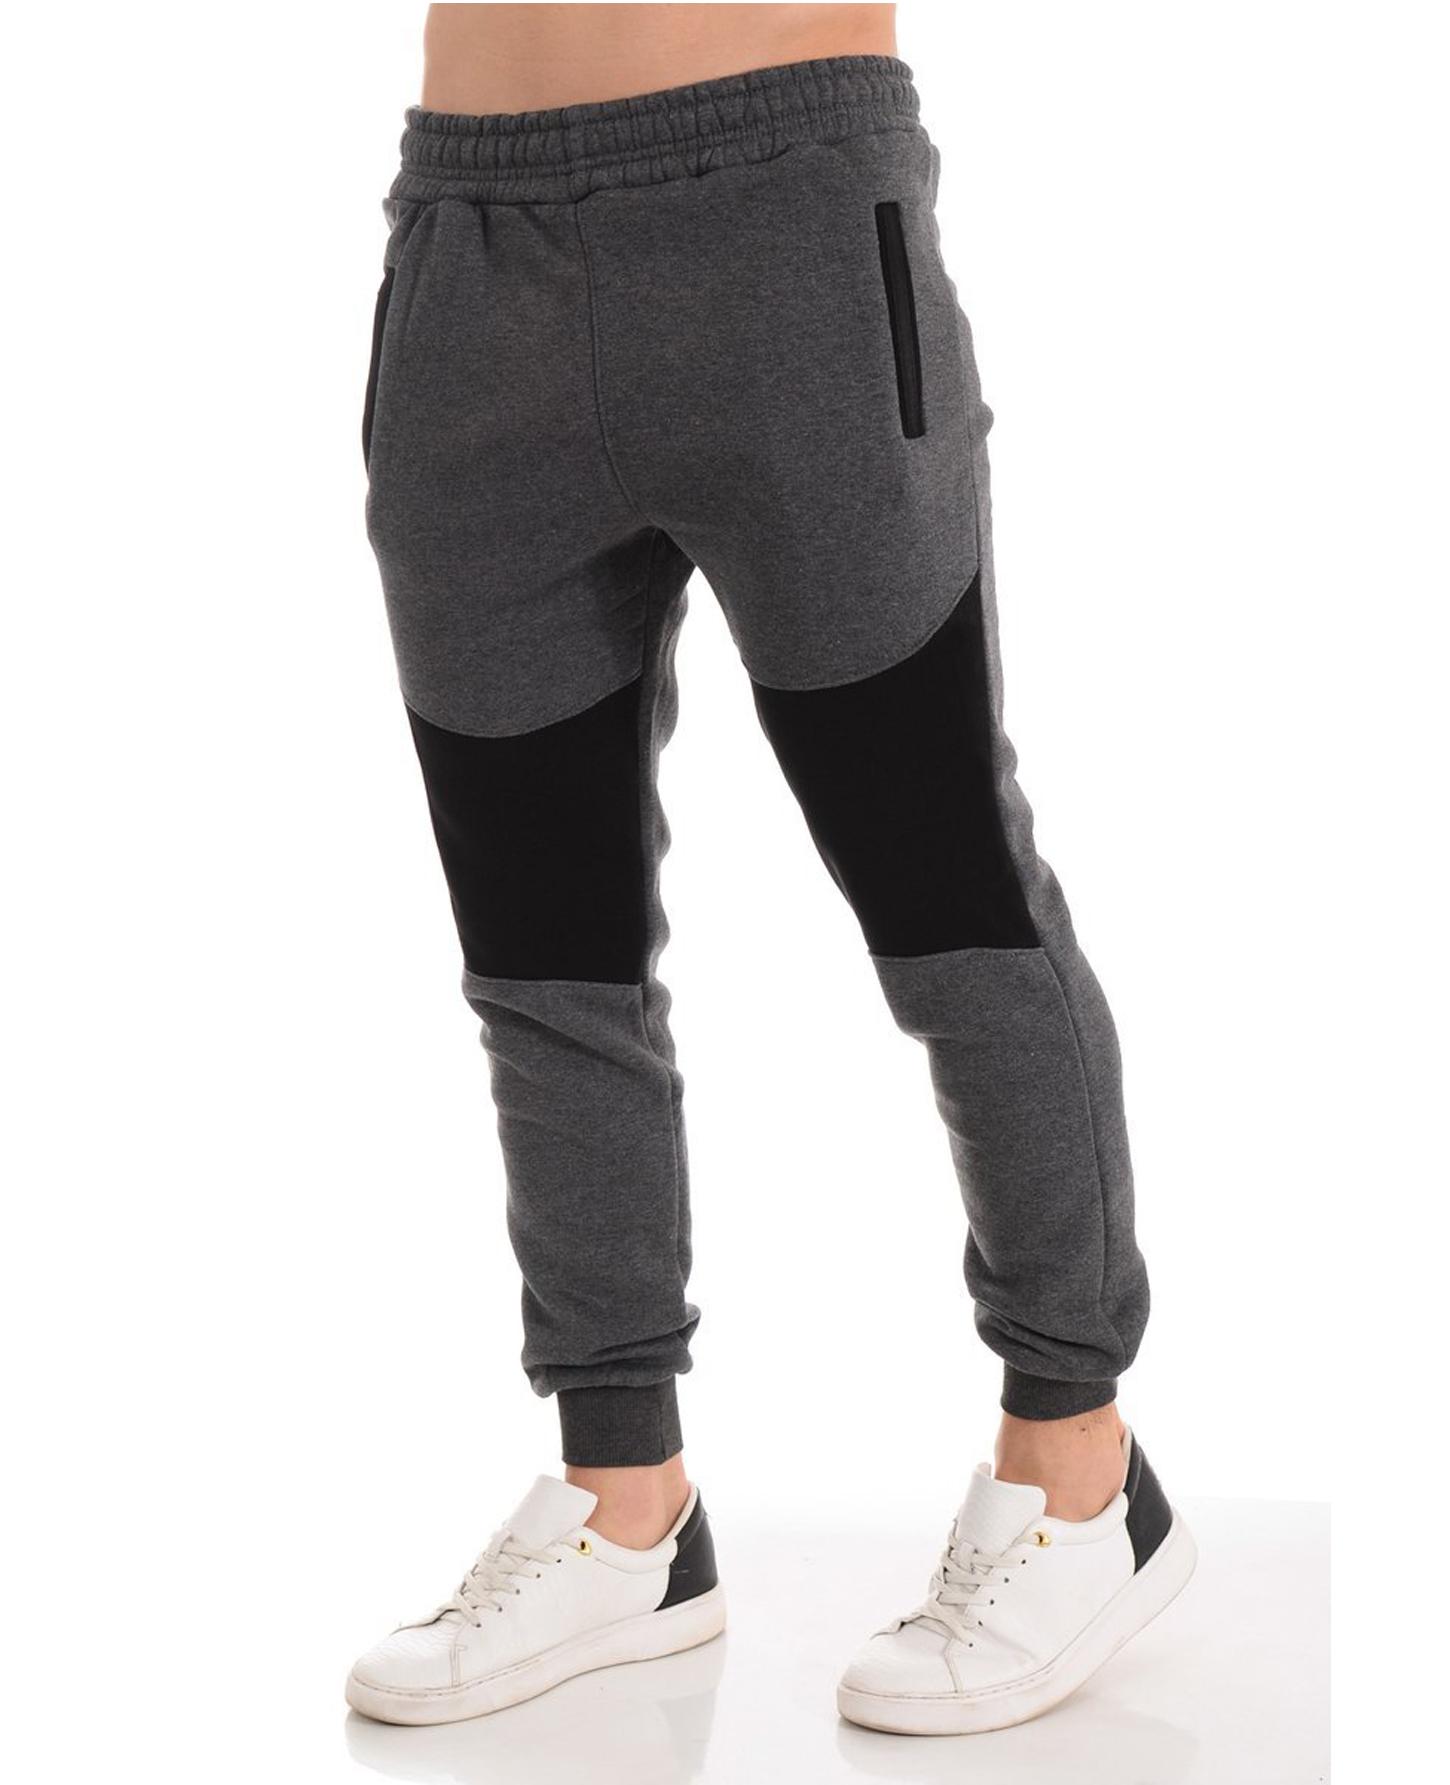 Men's Casual Zipper Stitching Trousers Autumn Pants Sports Jogging Pants 2020 New Men's Pants Tight Long Cotton Pants Sports Pants 0